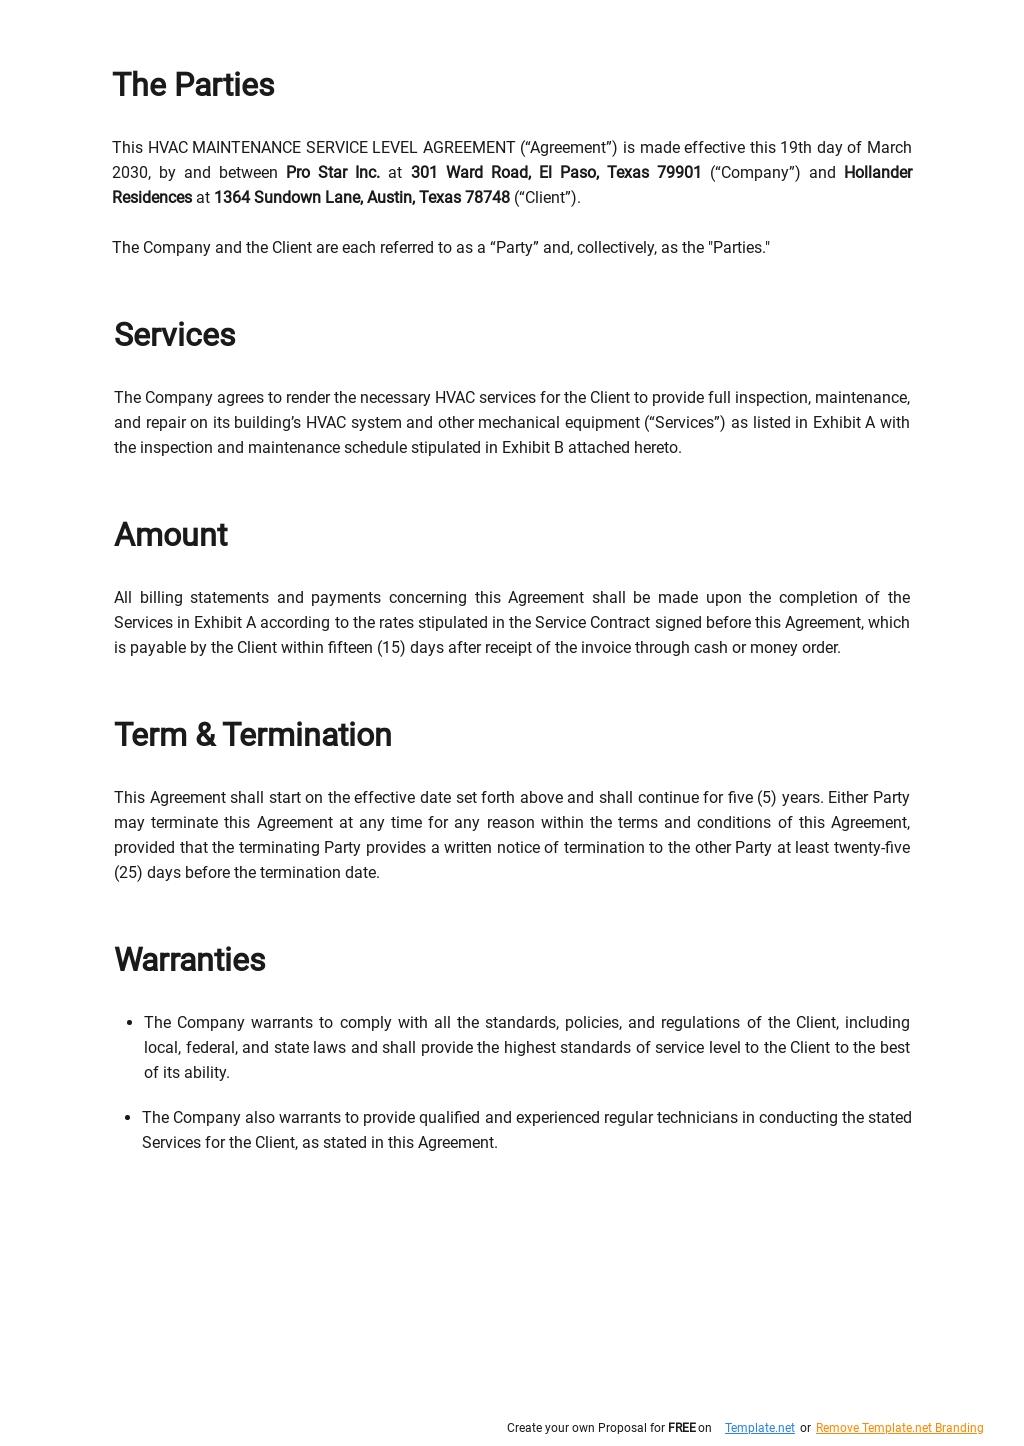 Free HVAC Maintenance Service Level Agreement Template 1.jpe